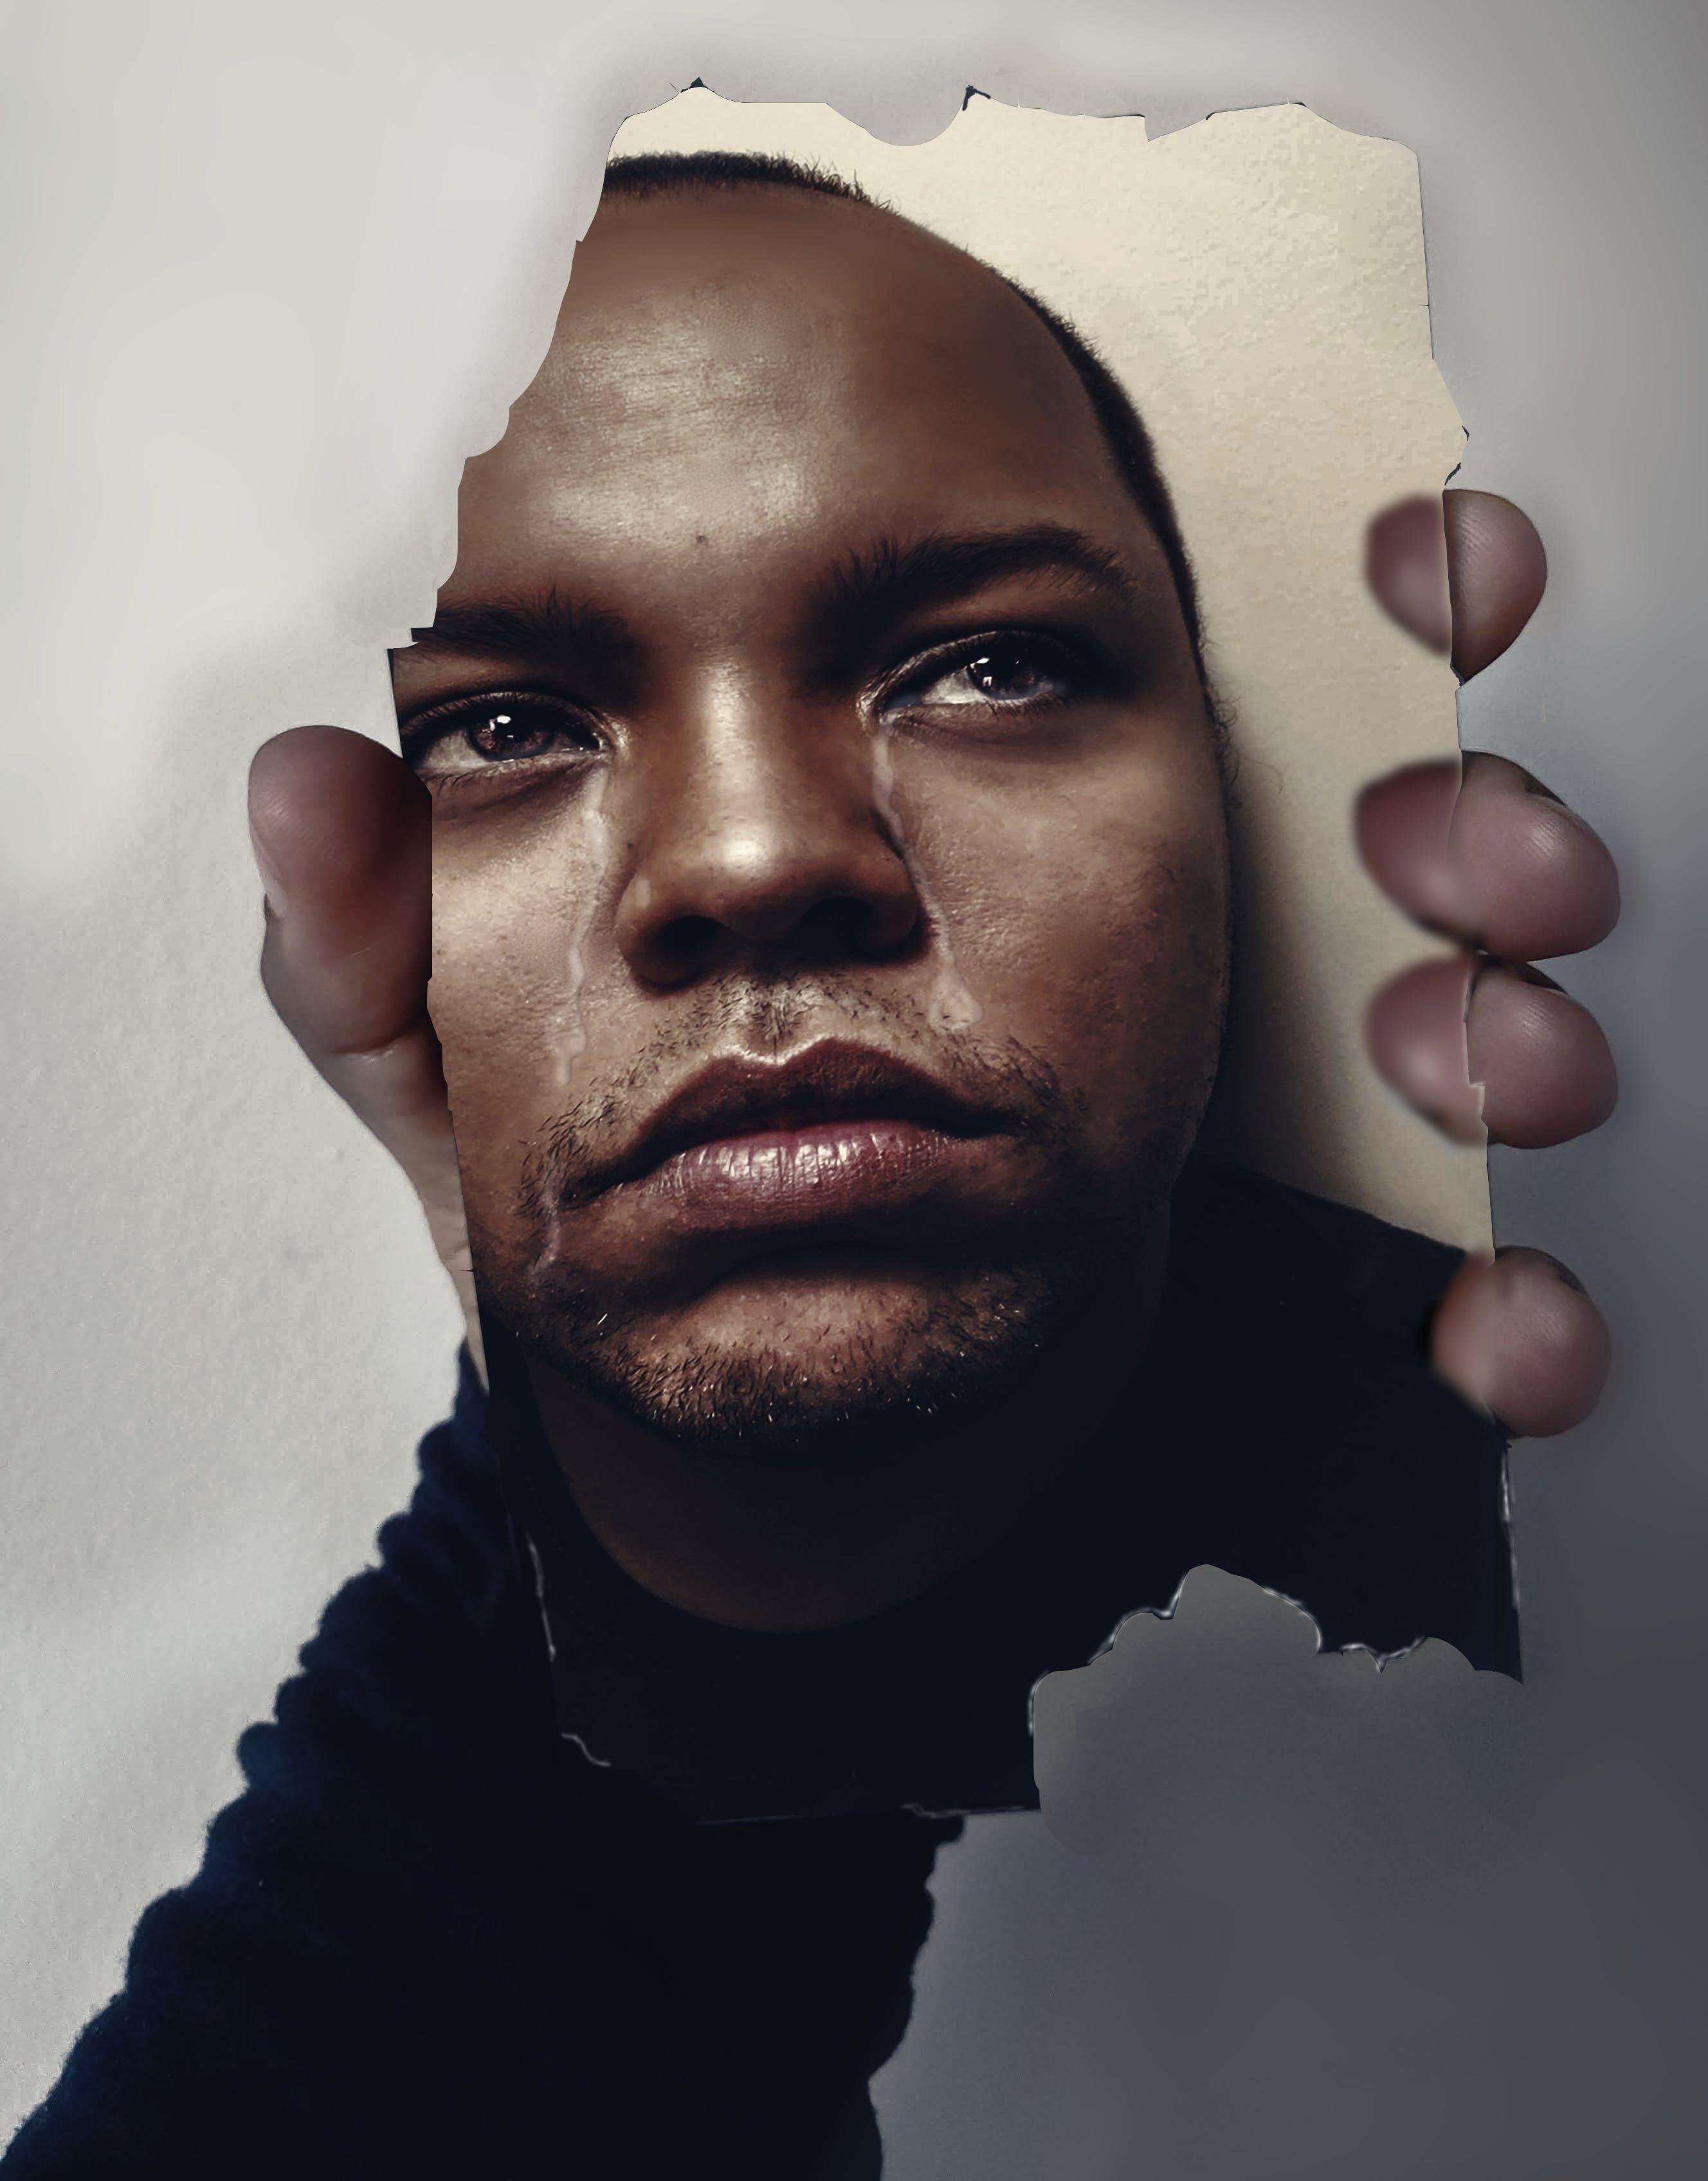 Free stock photo of Adobe Photoshop, depression, photo editing, portrait